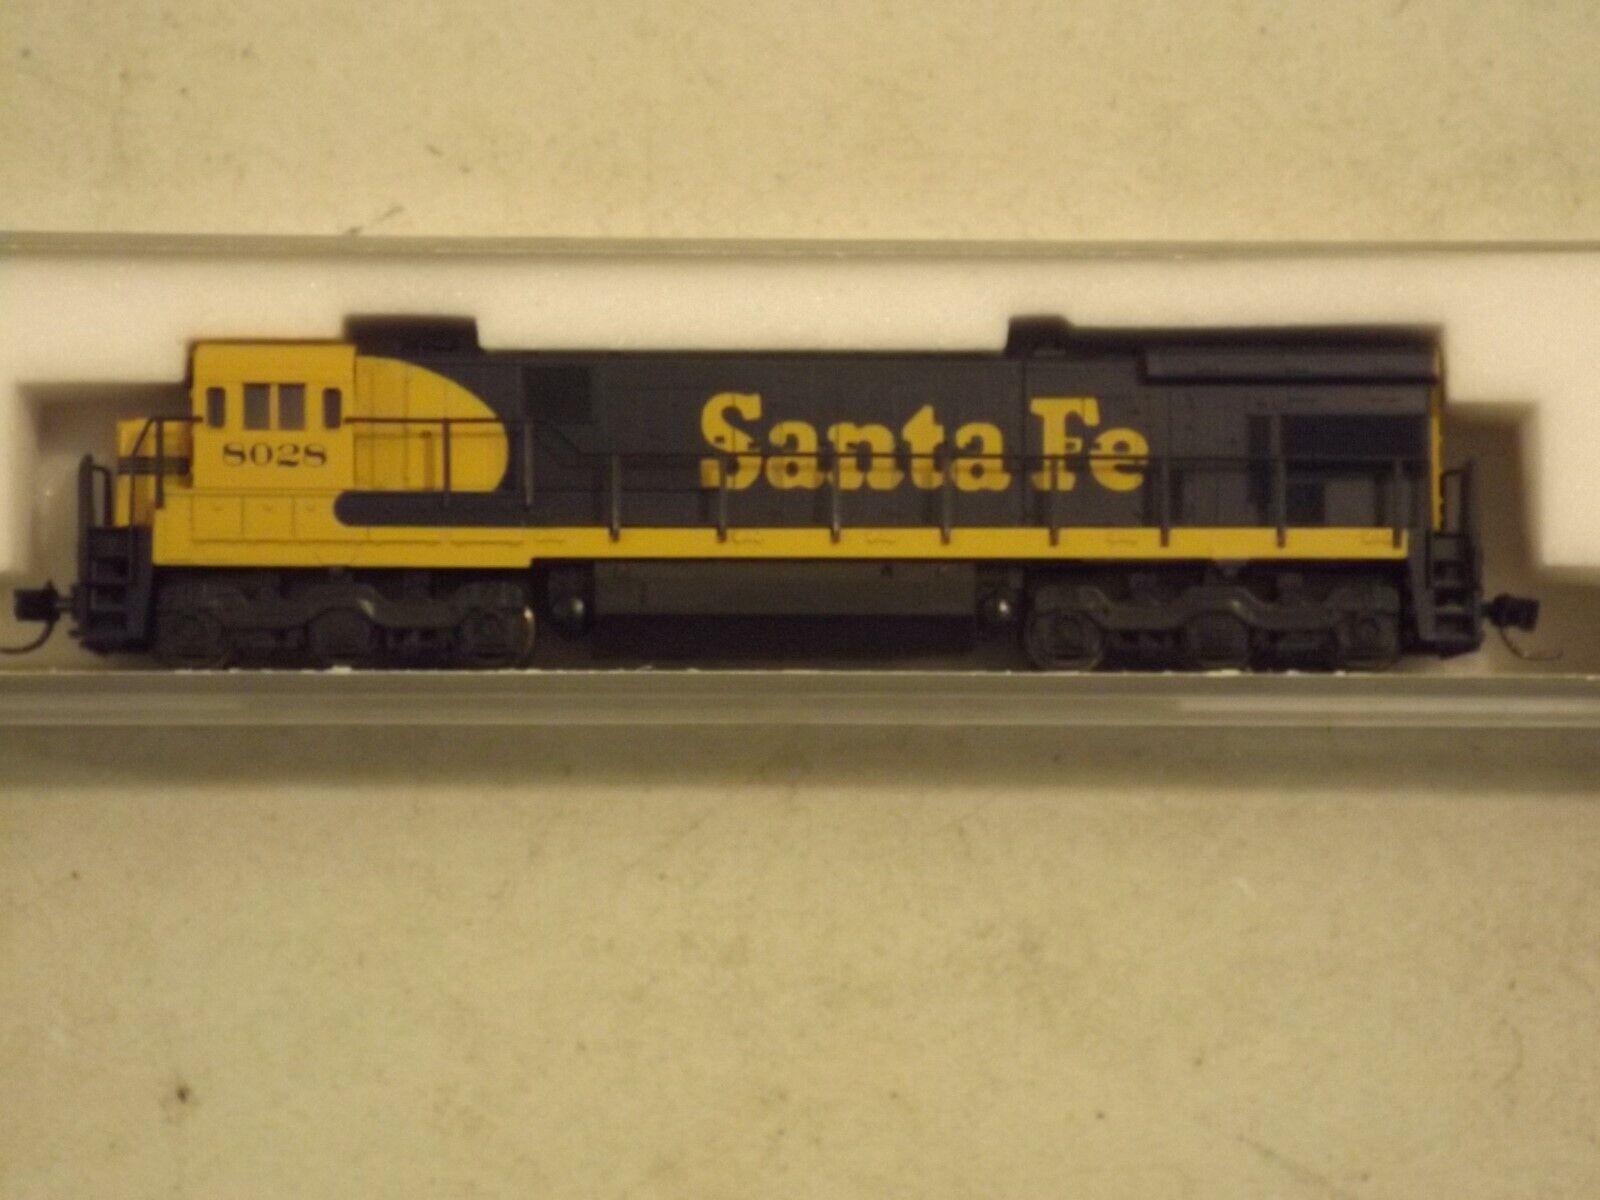 Offriamo vari marchi famosi N gauge gauge gauge Kato Santa Fe C30-7 diesel engine, in original scatola  stanno facendo attività di sconto